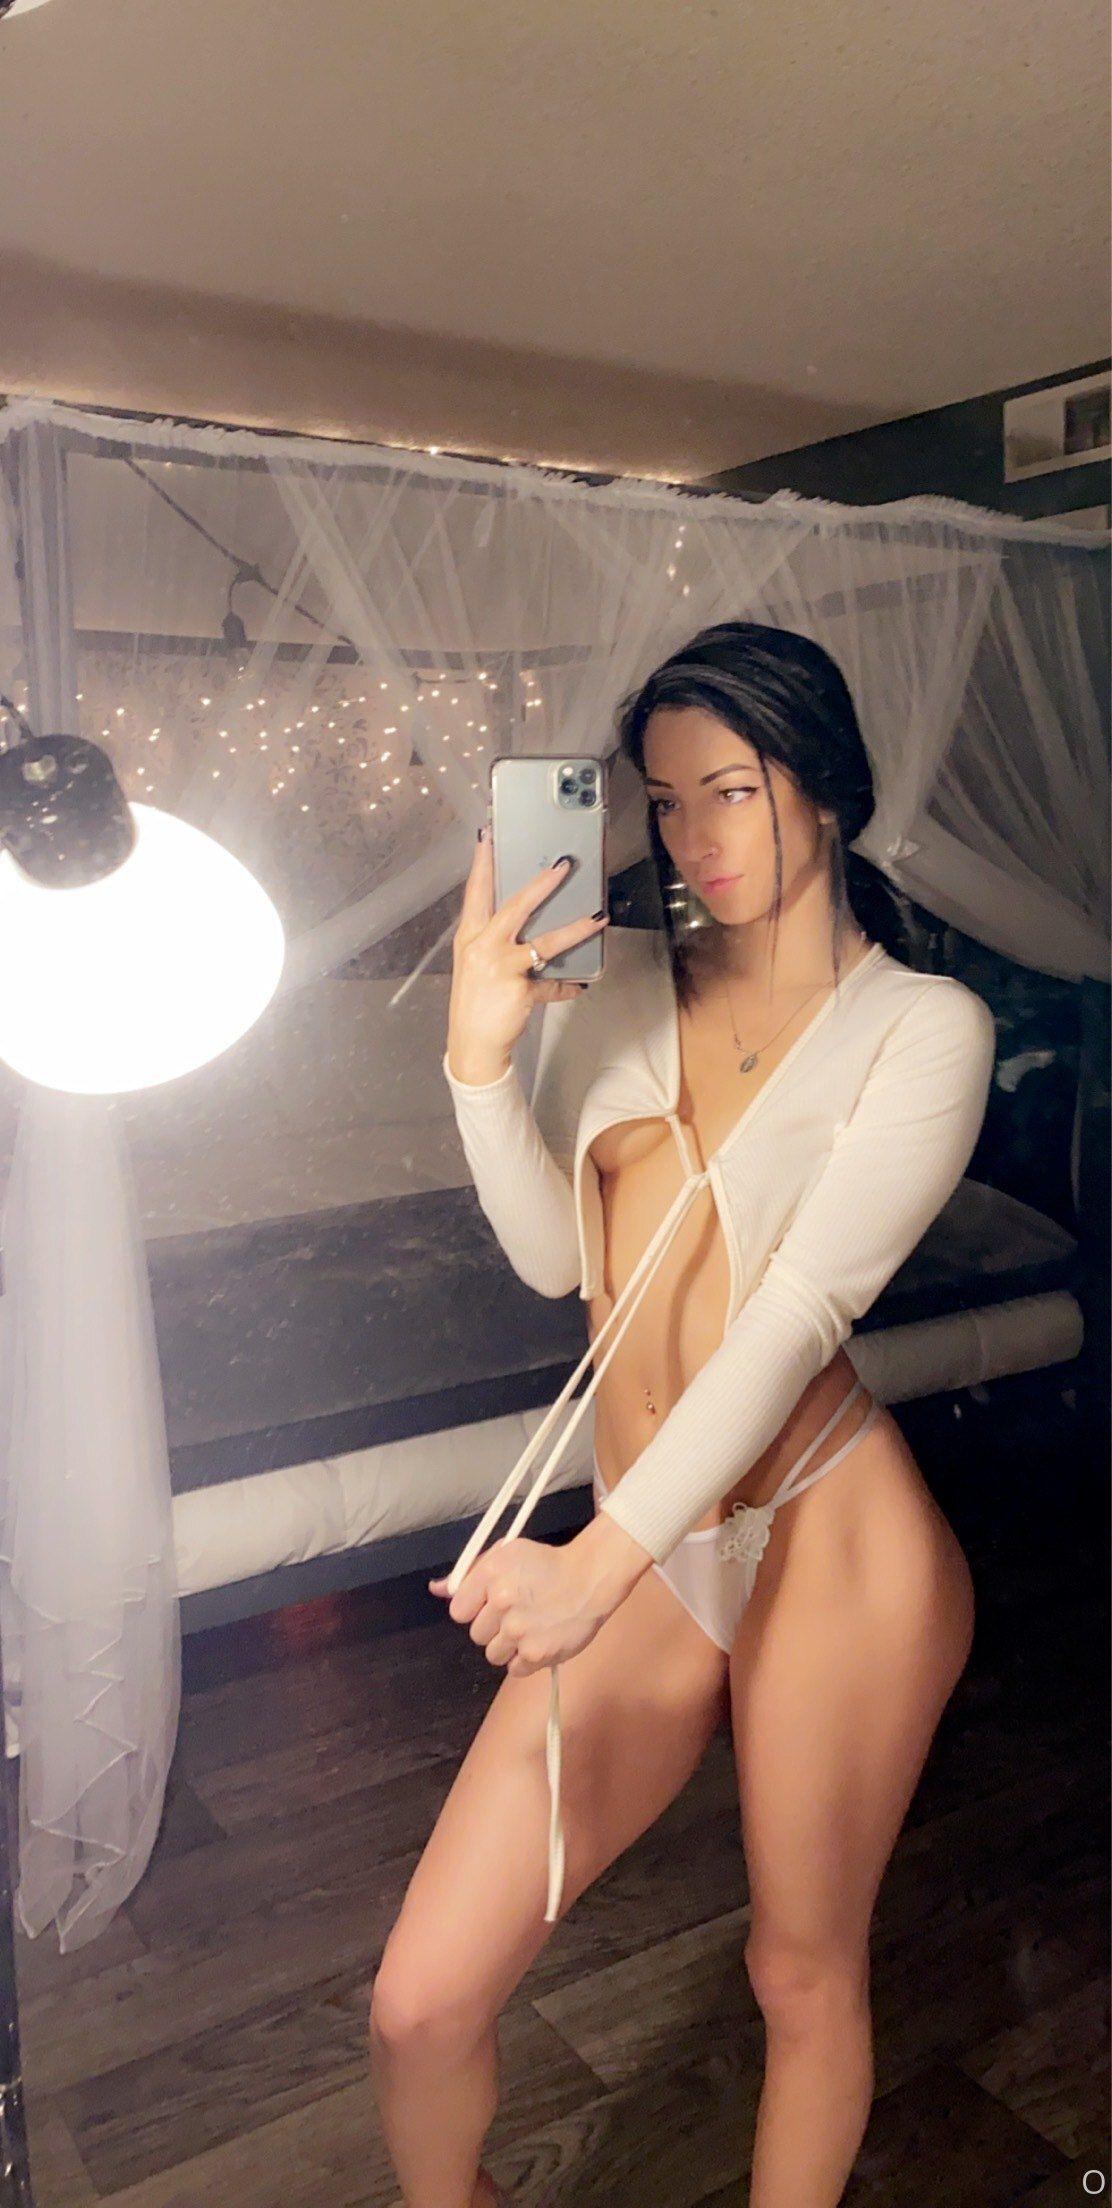 Karly Mergenthaler Nude Photos Onlyfans 0021